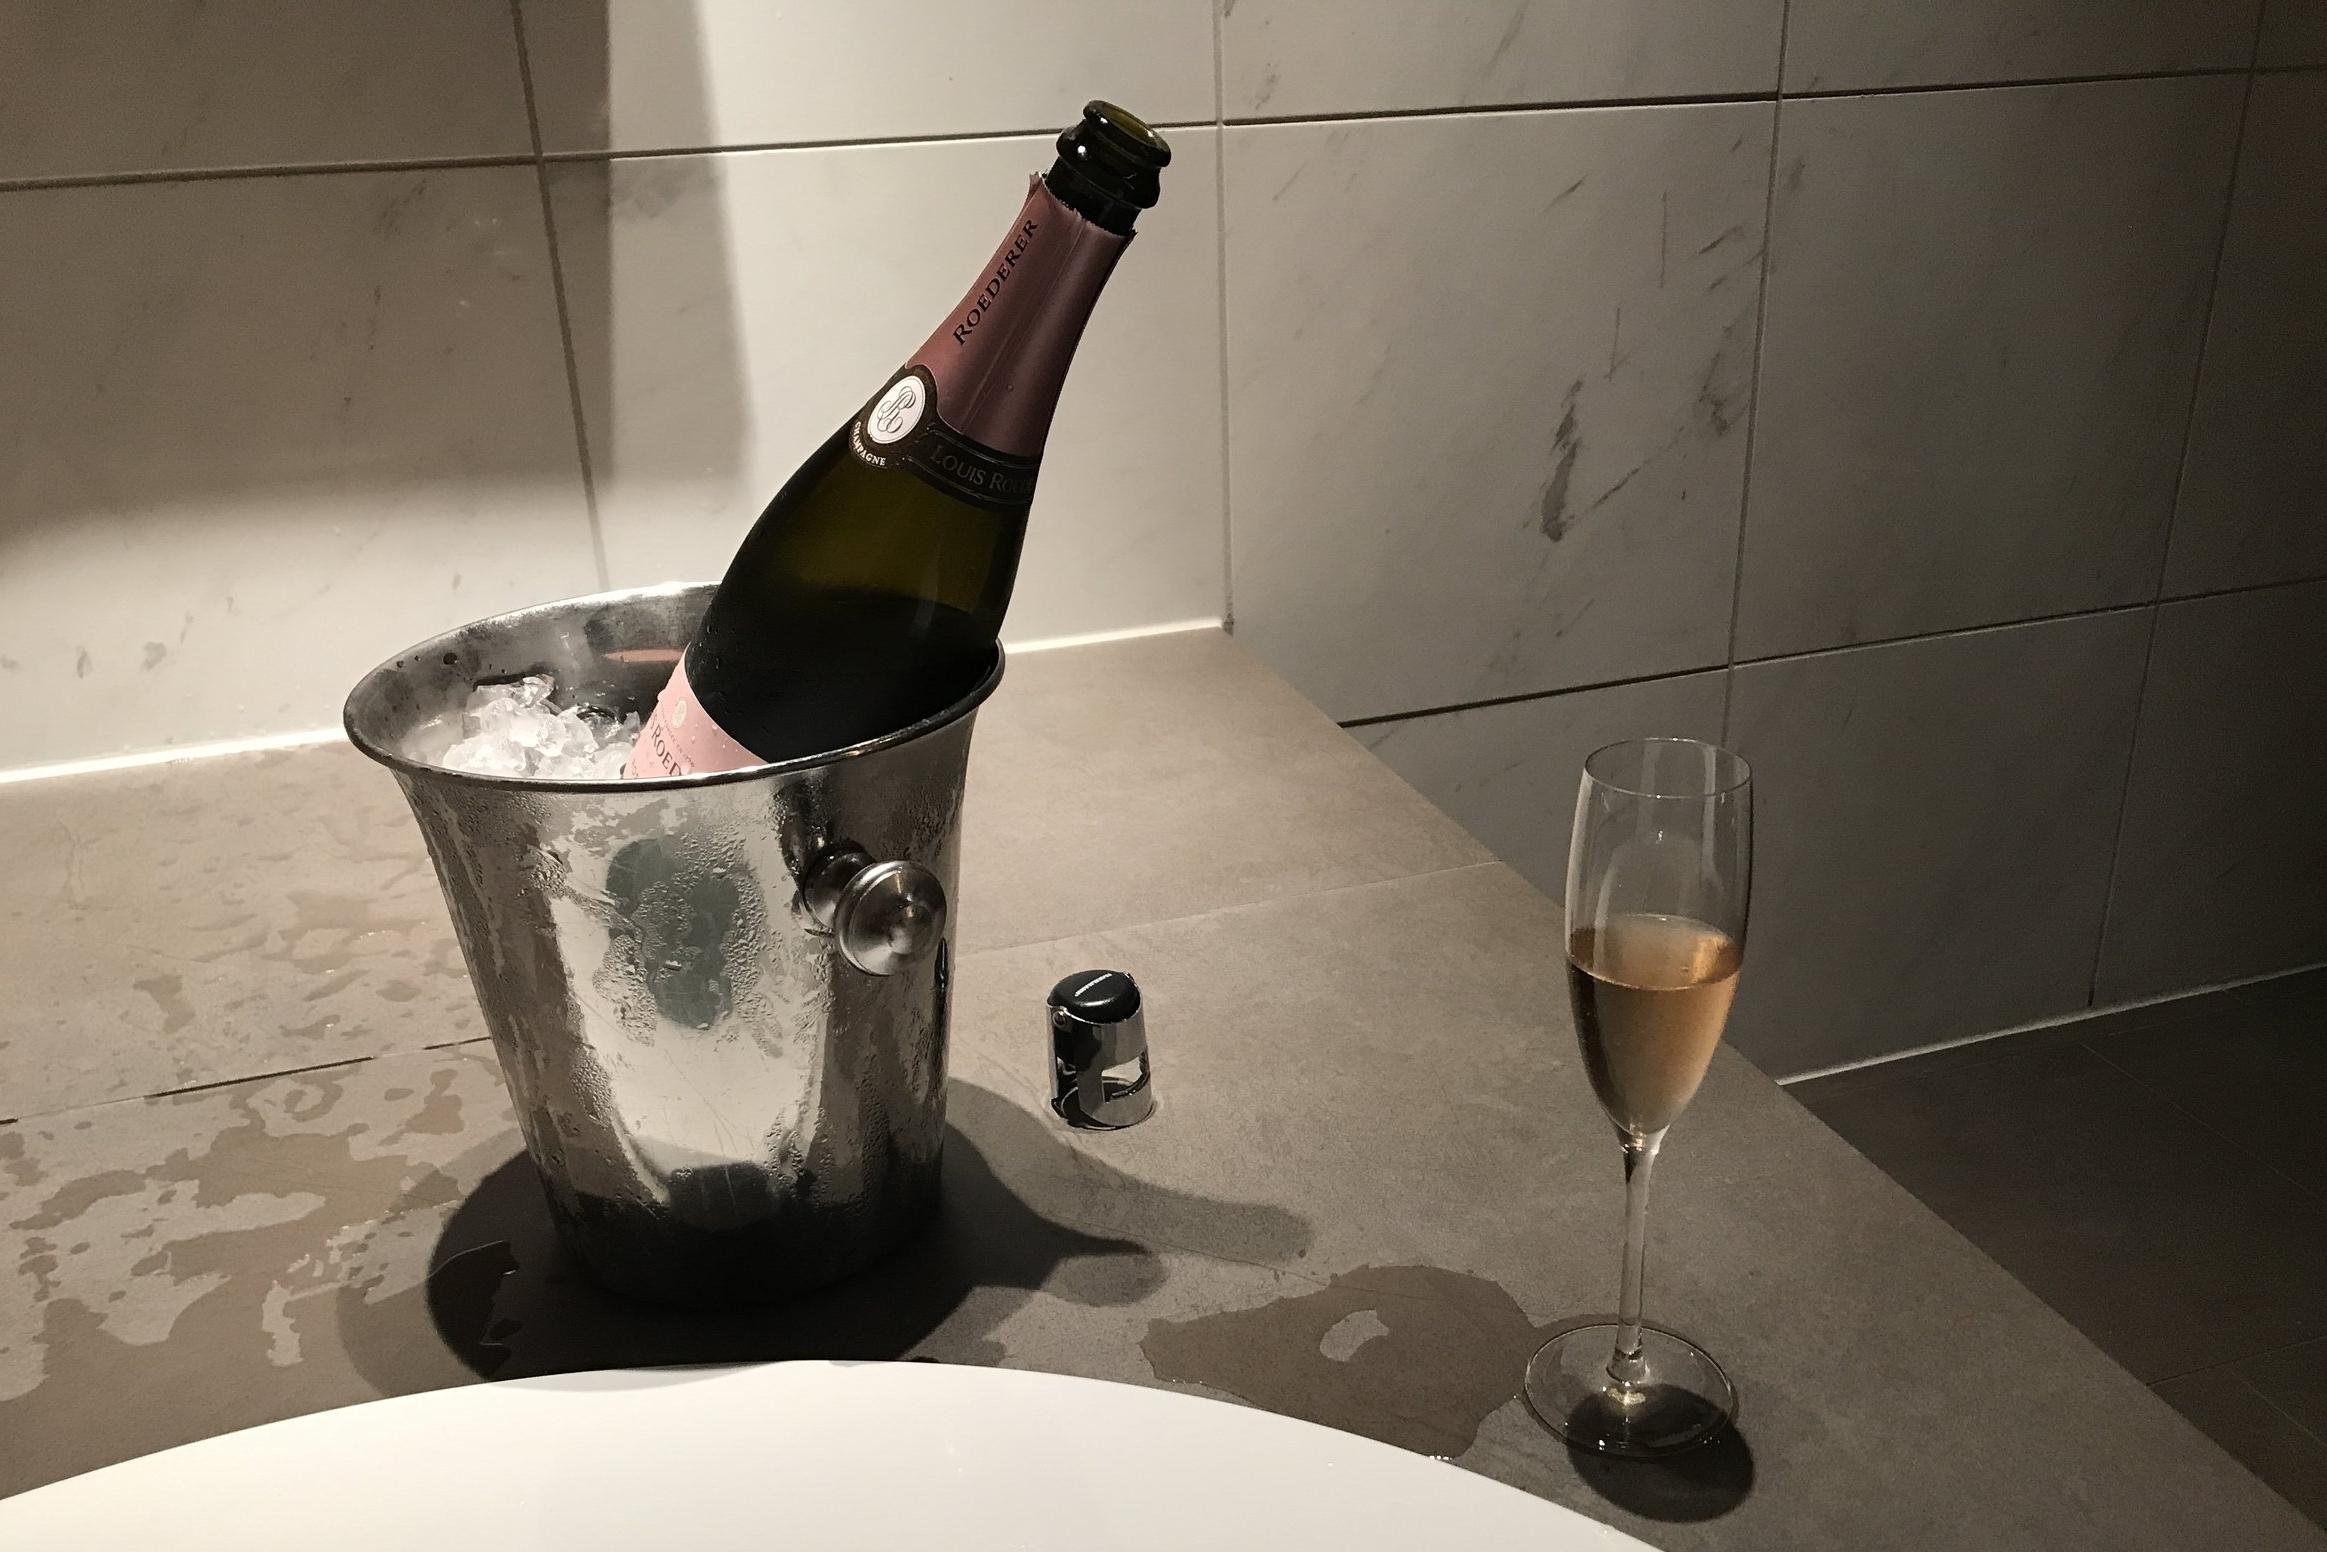 Lufthansa First Class Terminal Frankfurt – Champagne on ice